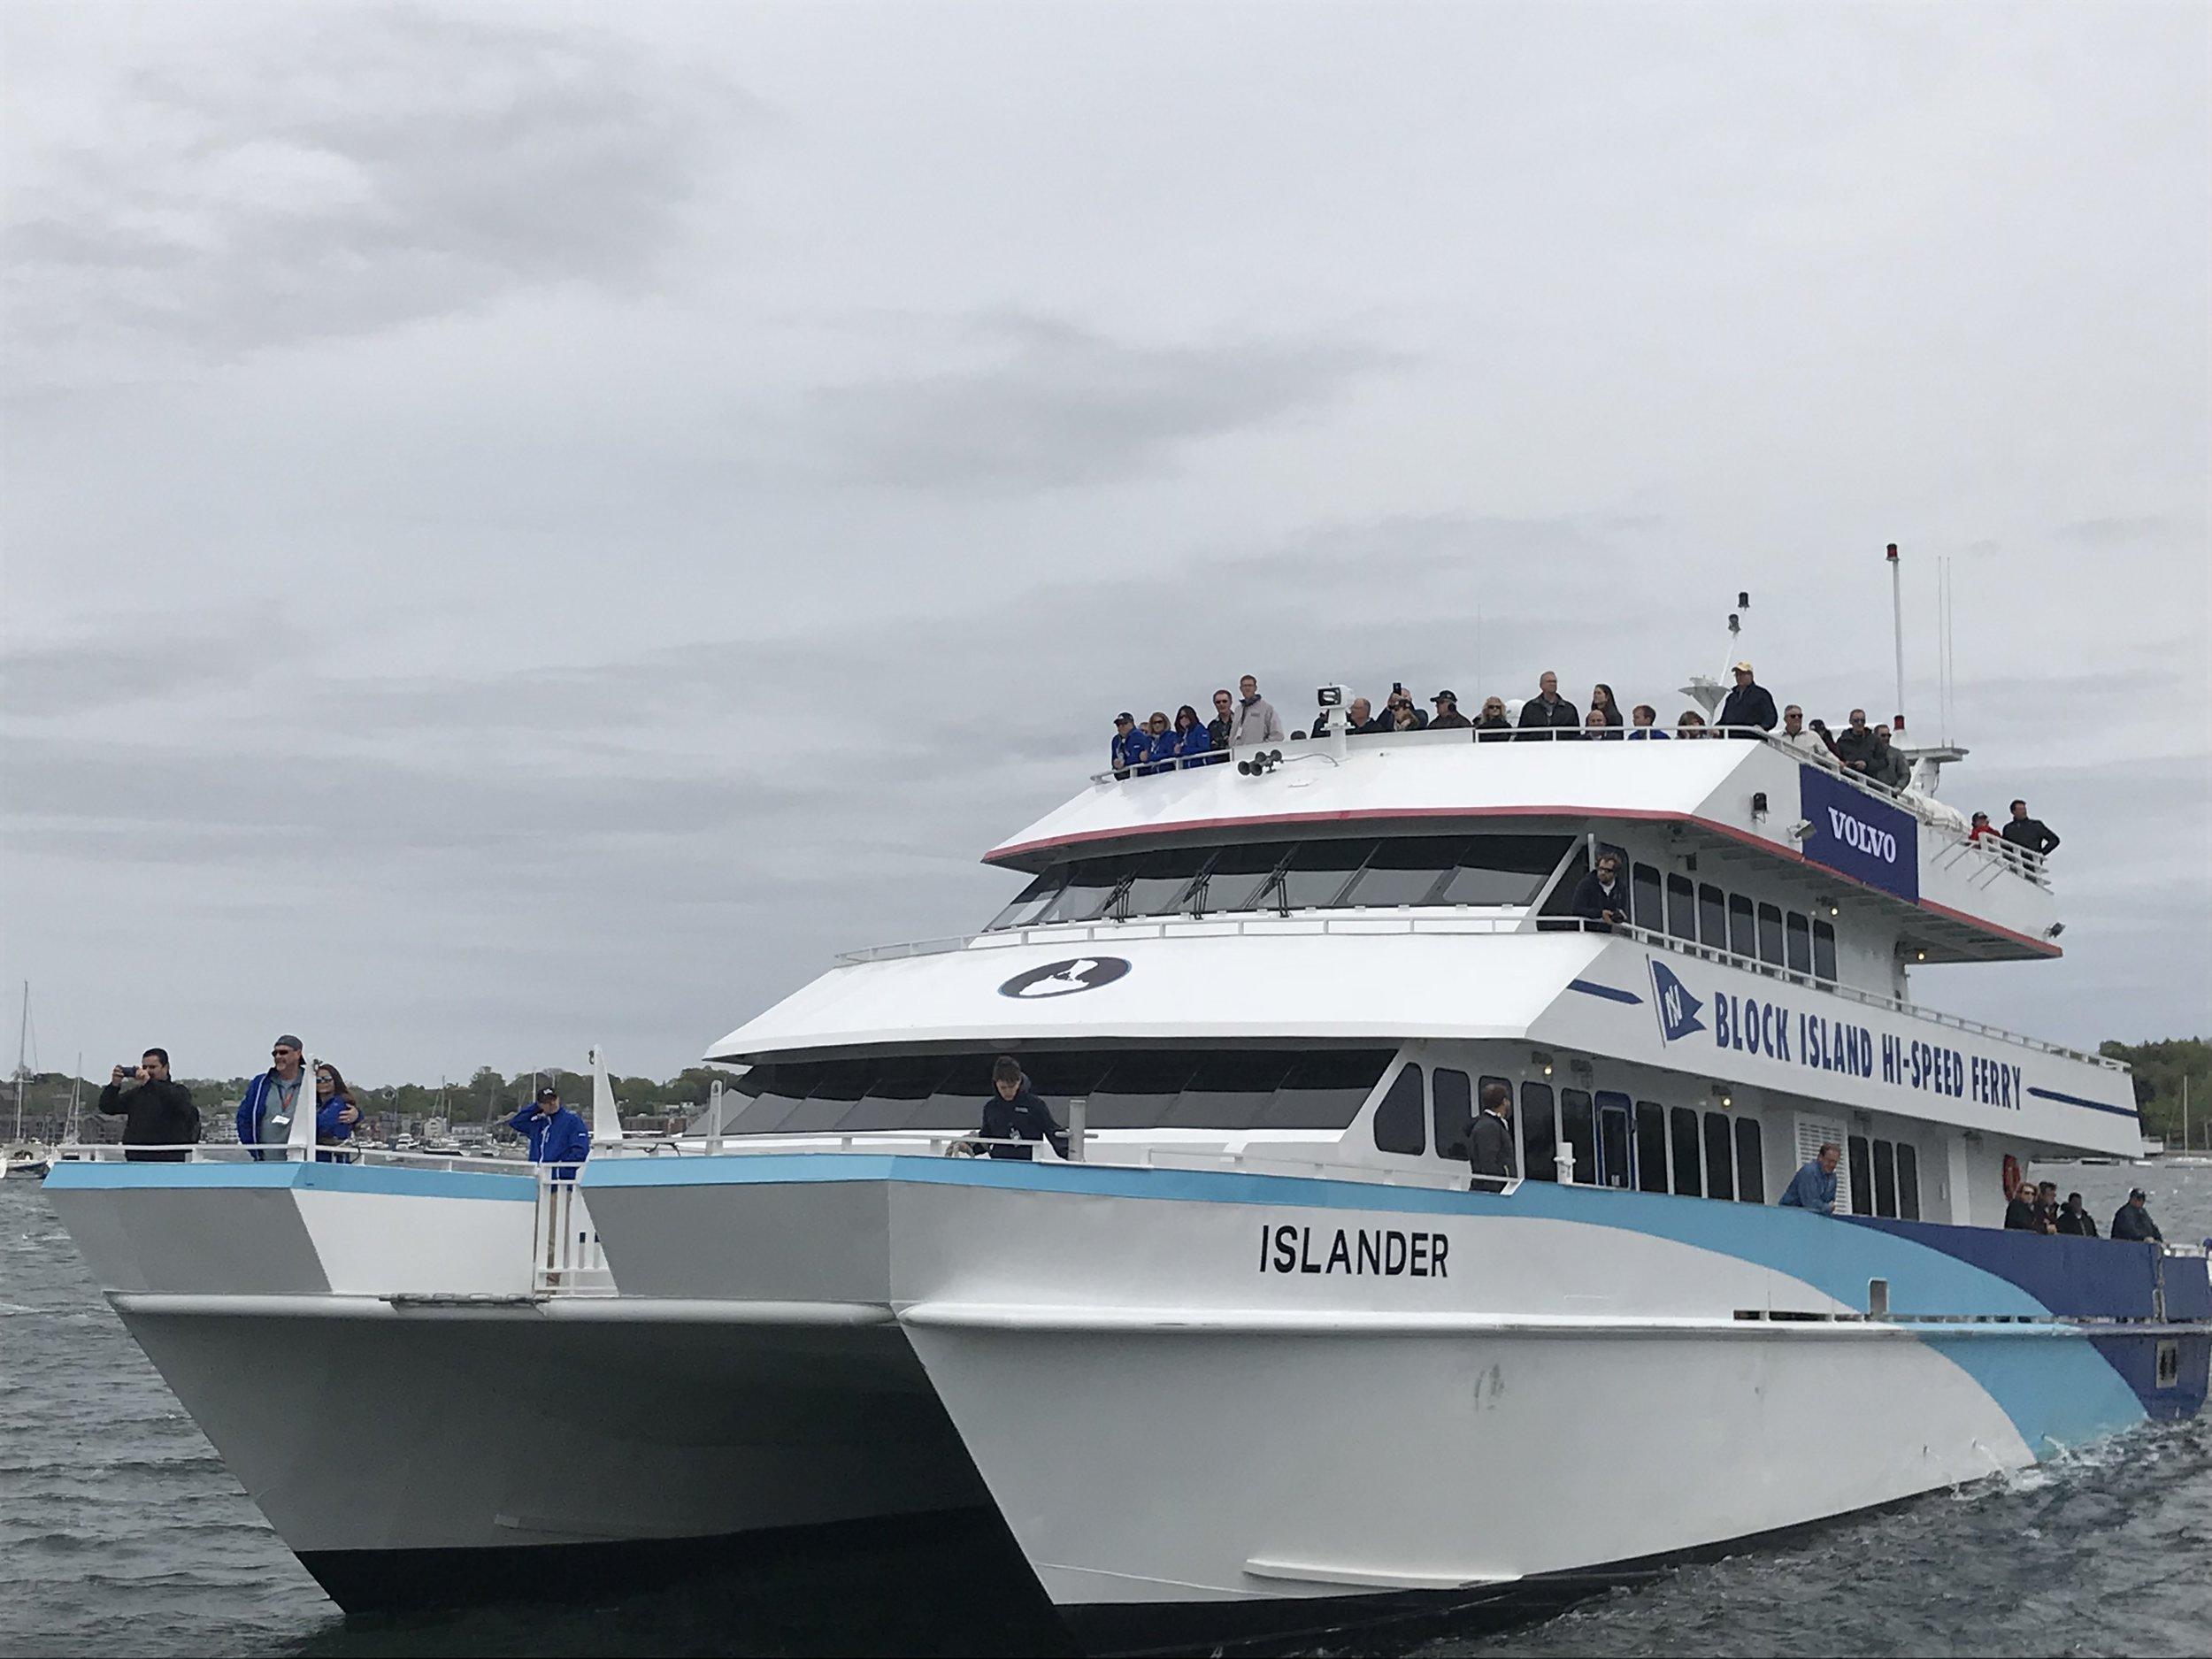 islander - volvo 2.jpg